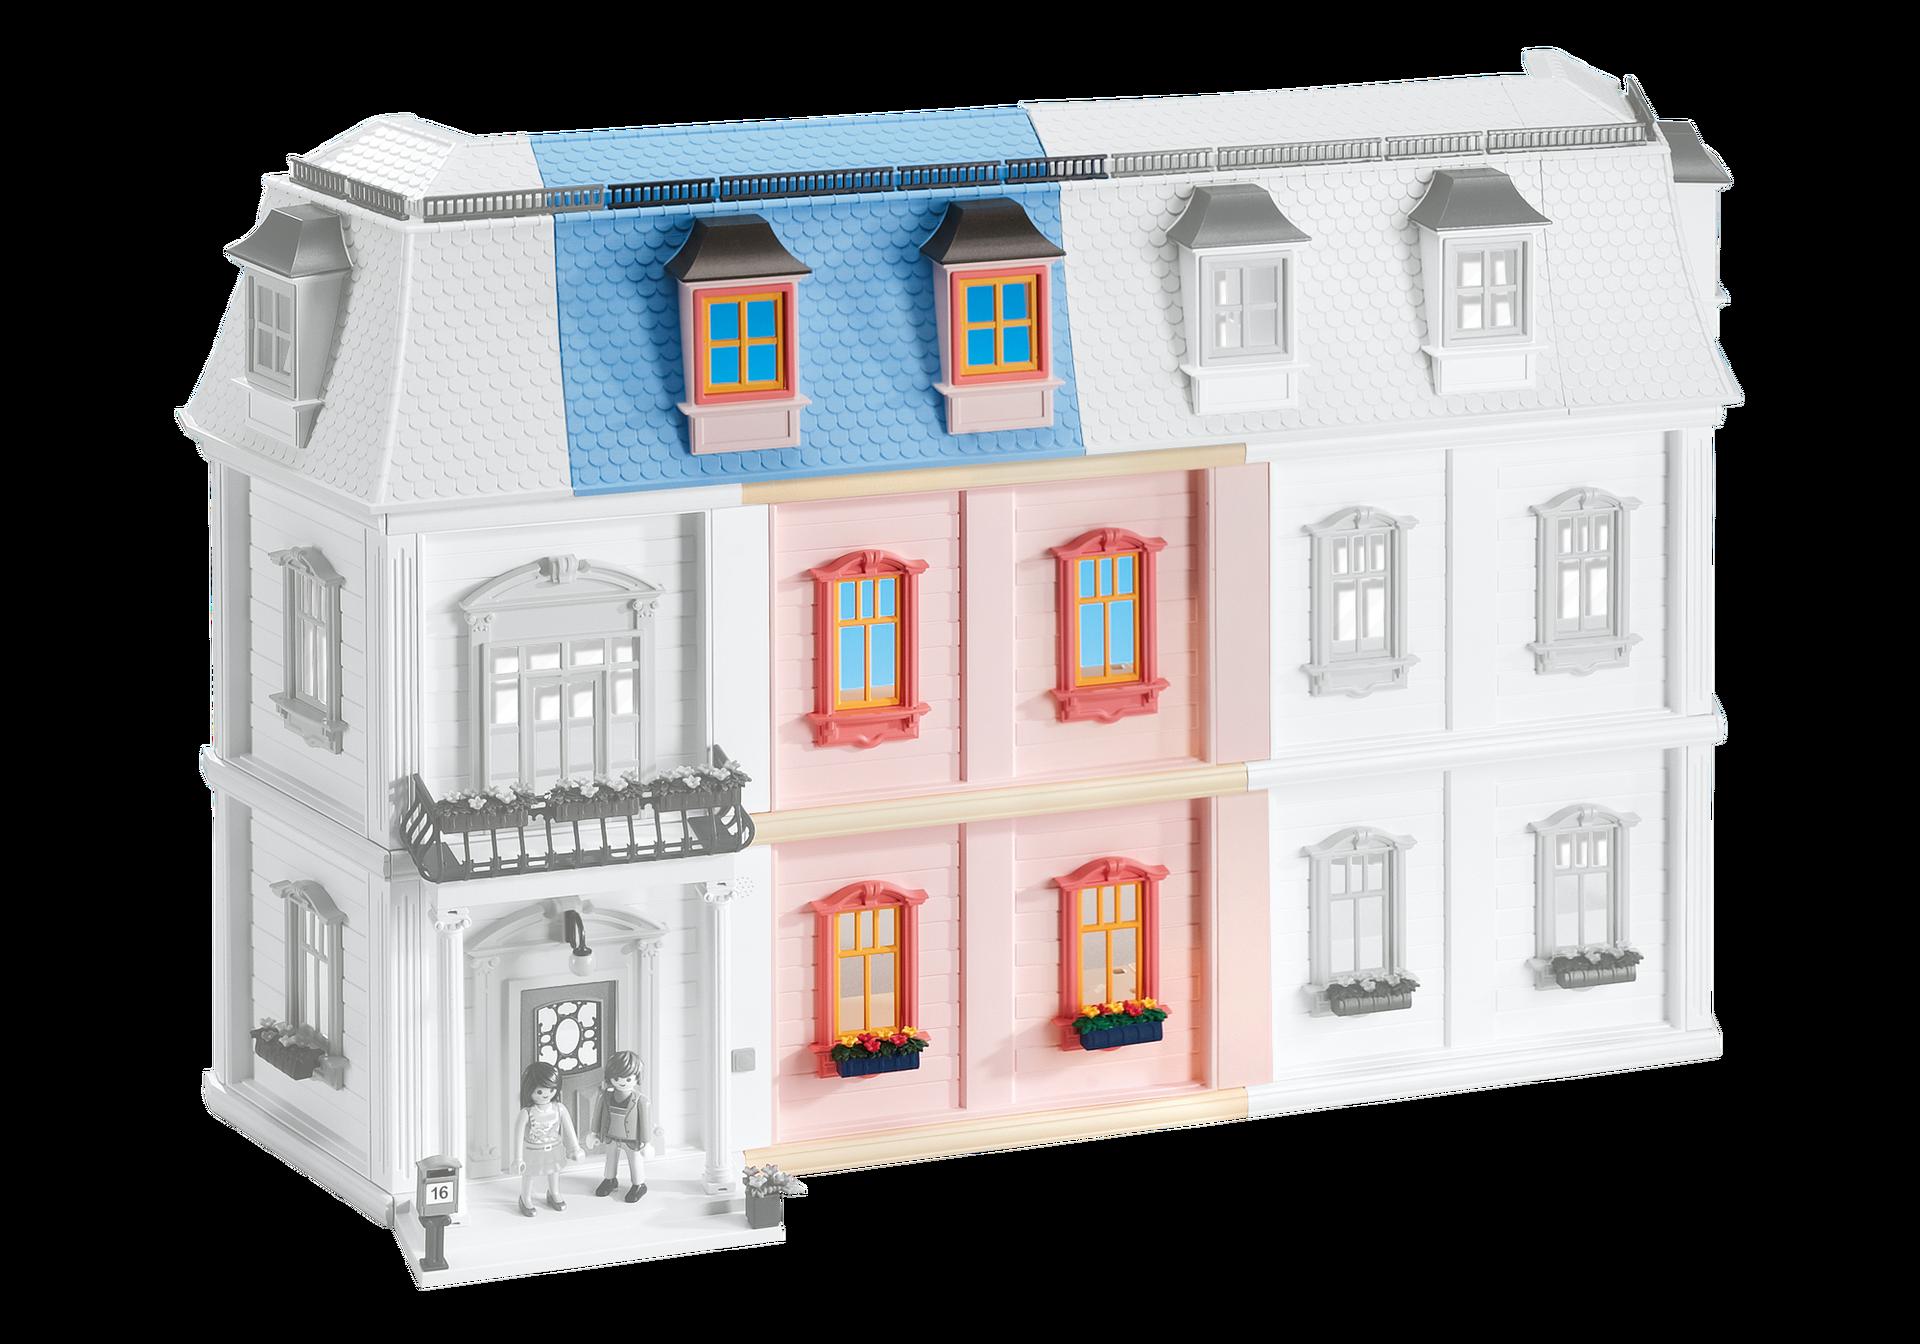 Playmobil Villa Ausmalbilder : Fantastisch Playmobil Luxusvilla Kinderzimmer Fotos